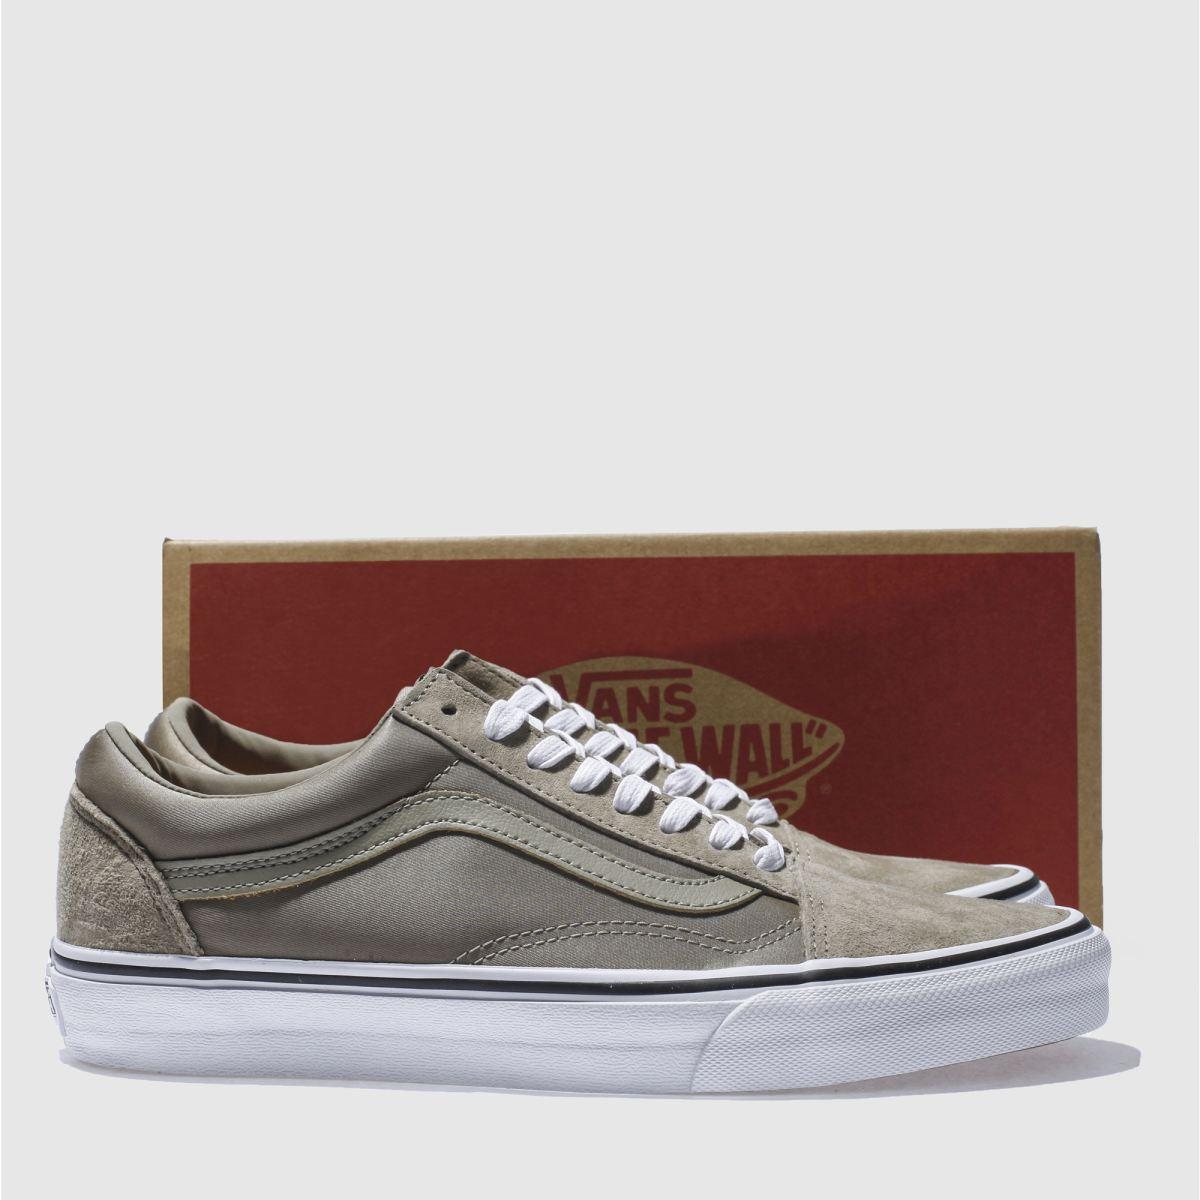 Damen Khaki Boom vans Old Skool Boom Boom Khaki Sneaker | schuh Gute Qualität beliebte Schuhe 341323